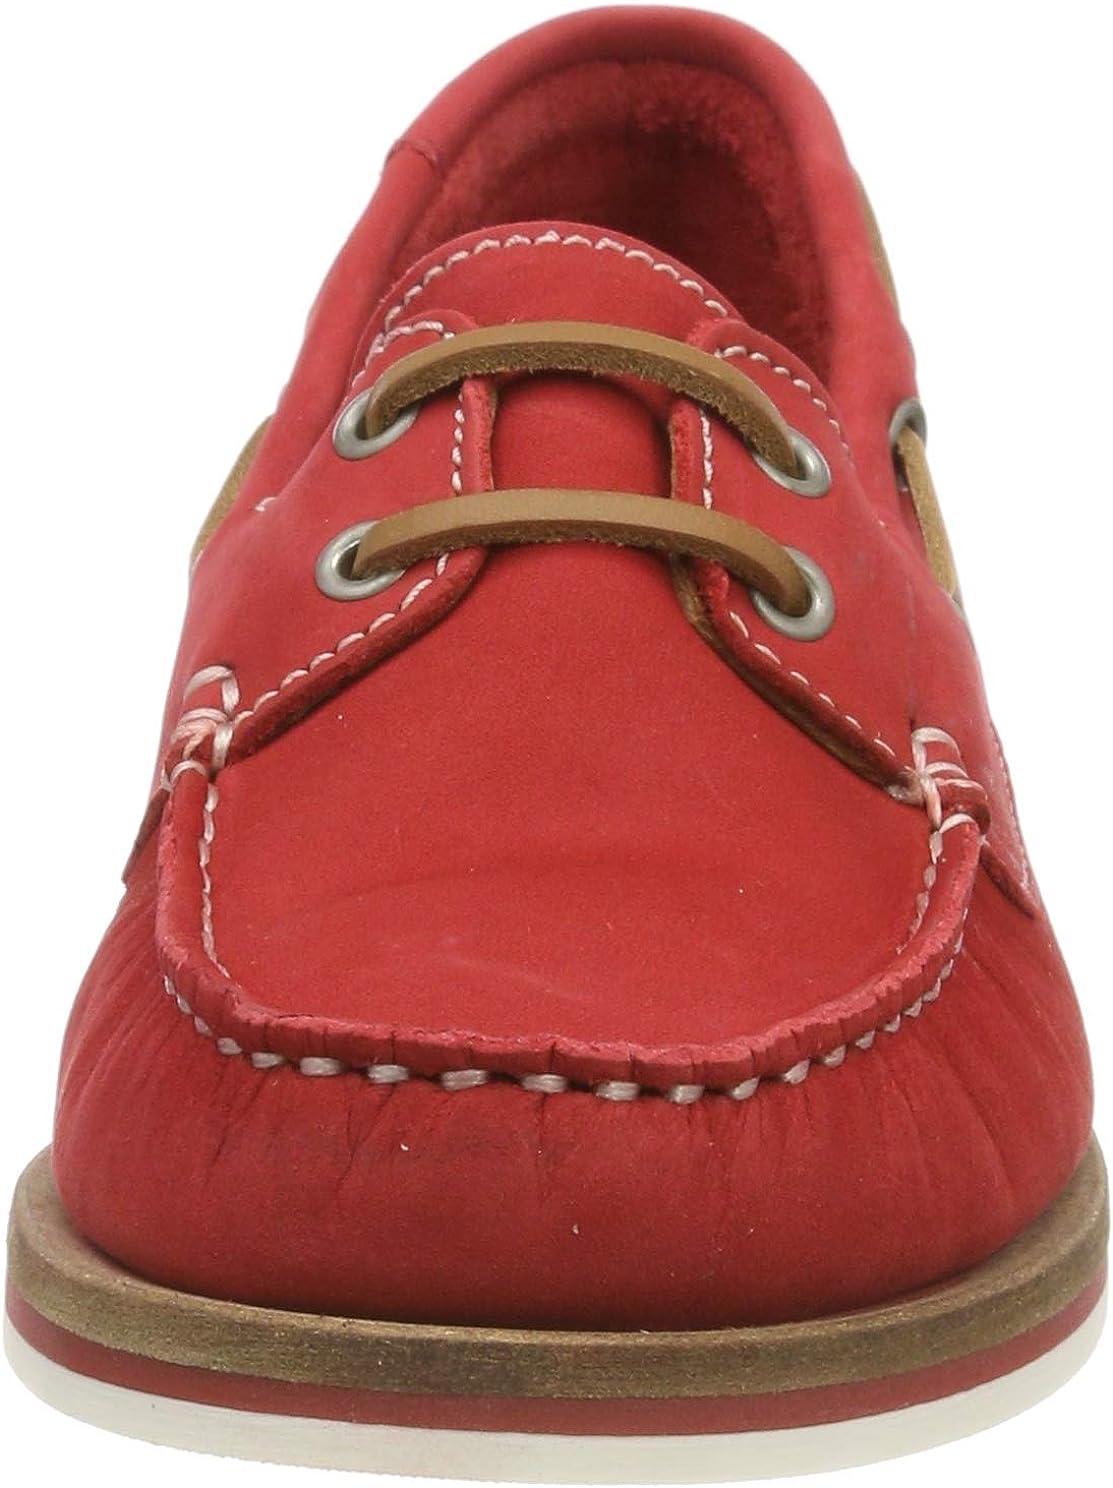 Tamaris 1-1-23616-22, Sneakers Basses Femme Rouge Red Nubuc 601